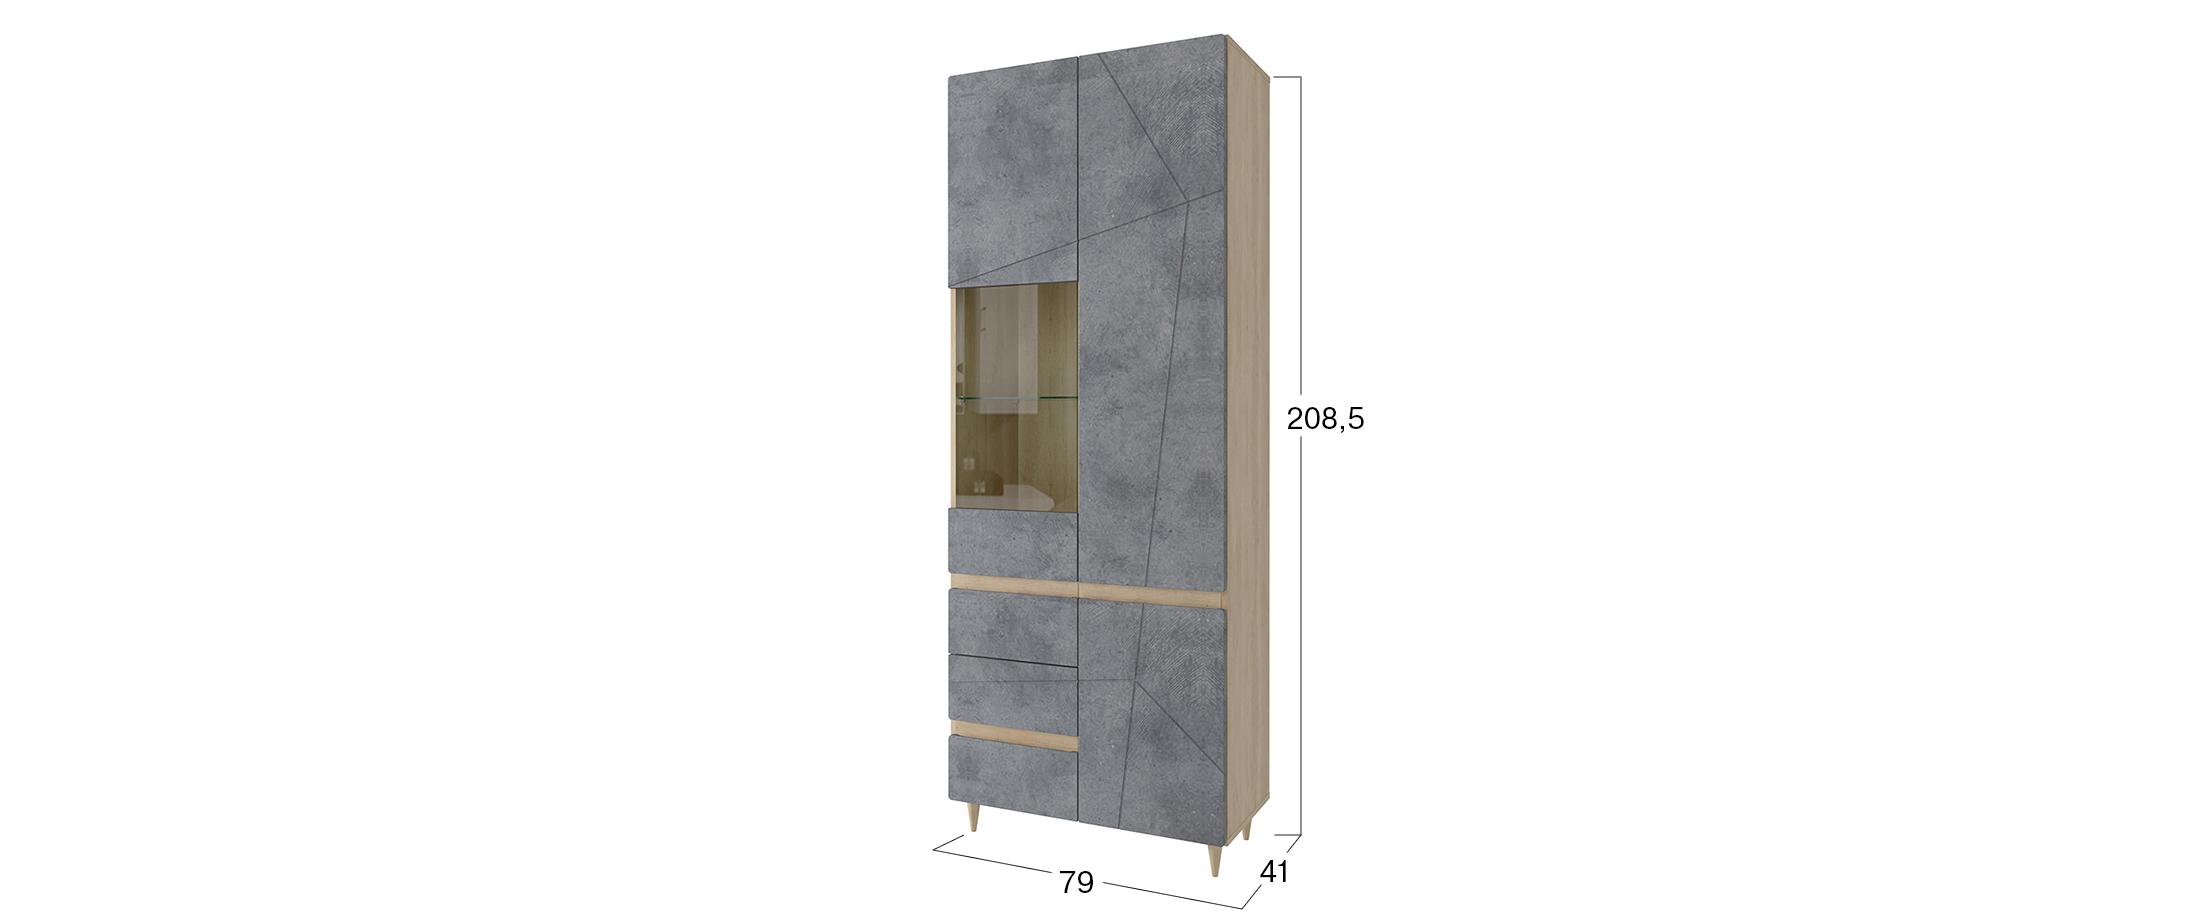 Шкаф Киото со стеклом Модель 295